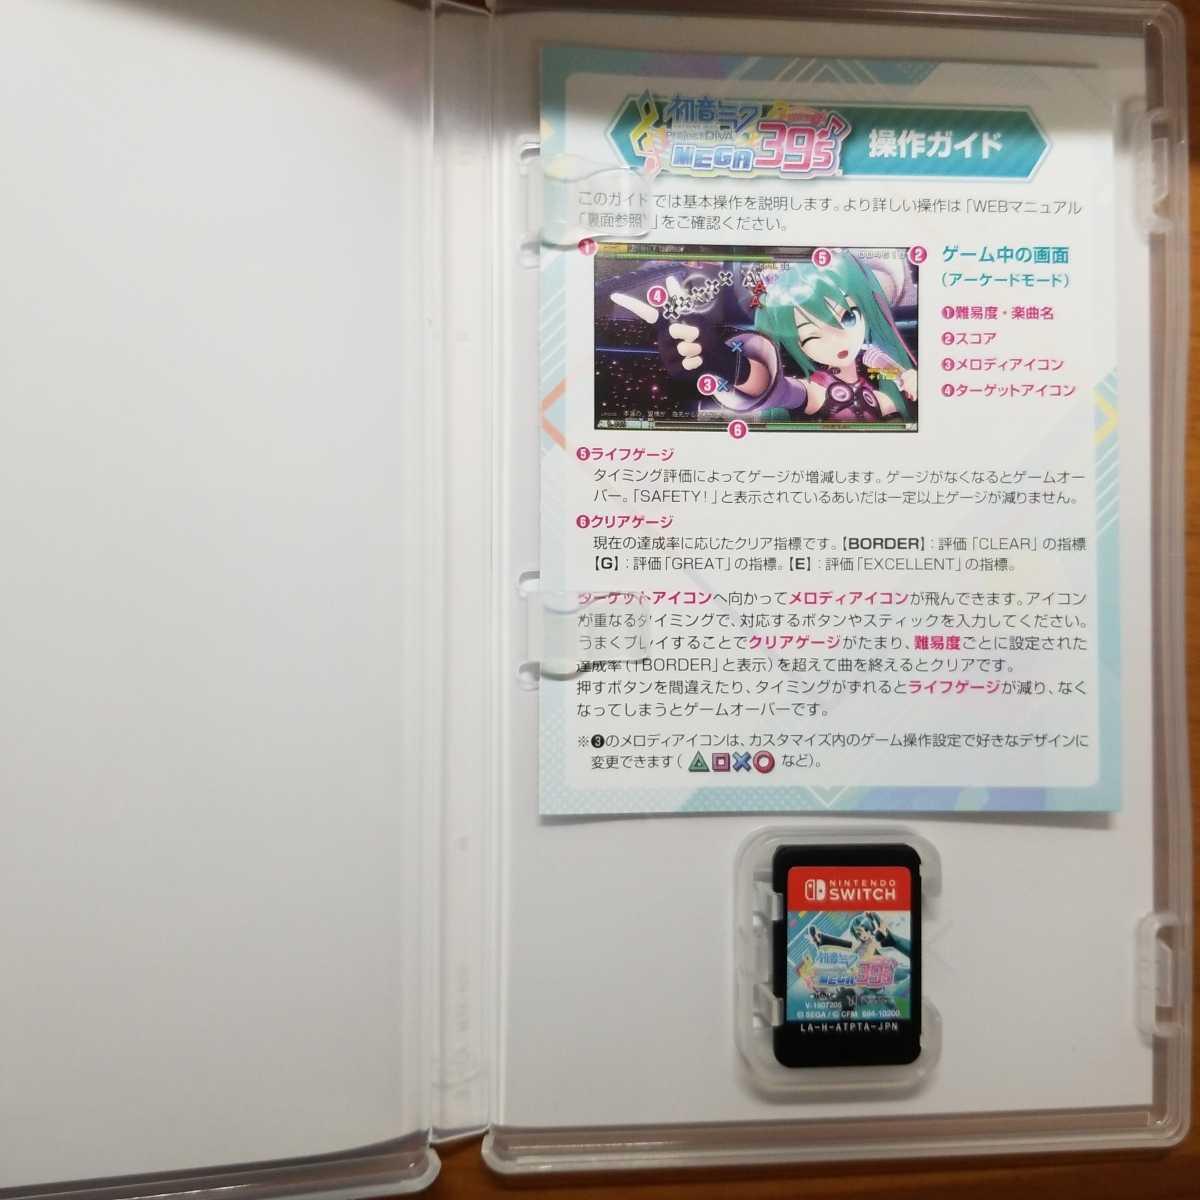 Switch 初音ミク Project DIVA MEGA39's スイッチ 送料無料 ソフト